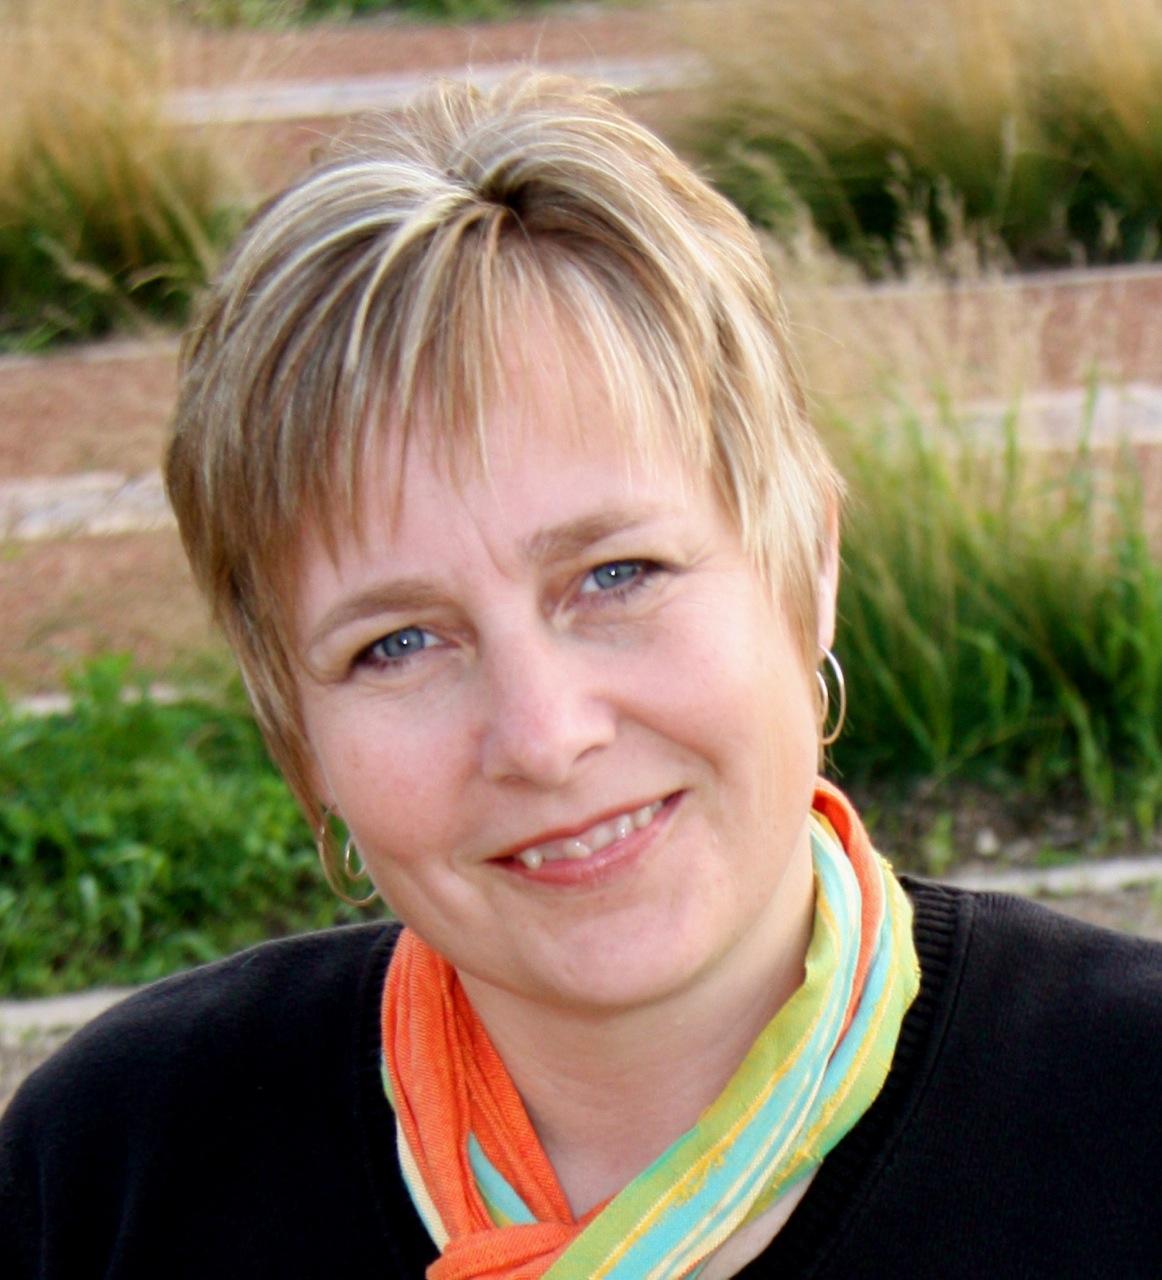 Fumbling for balance - Heather Plett